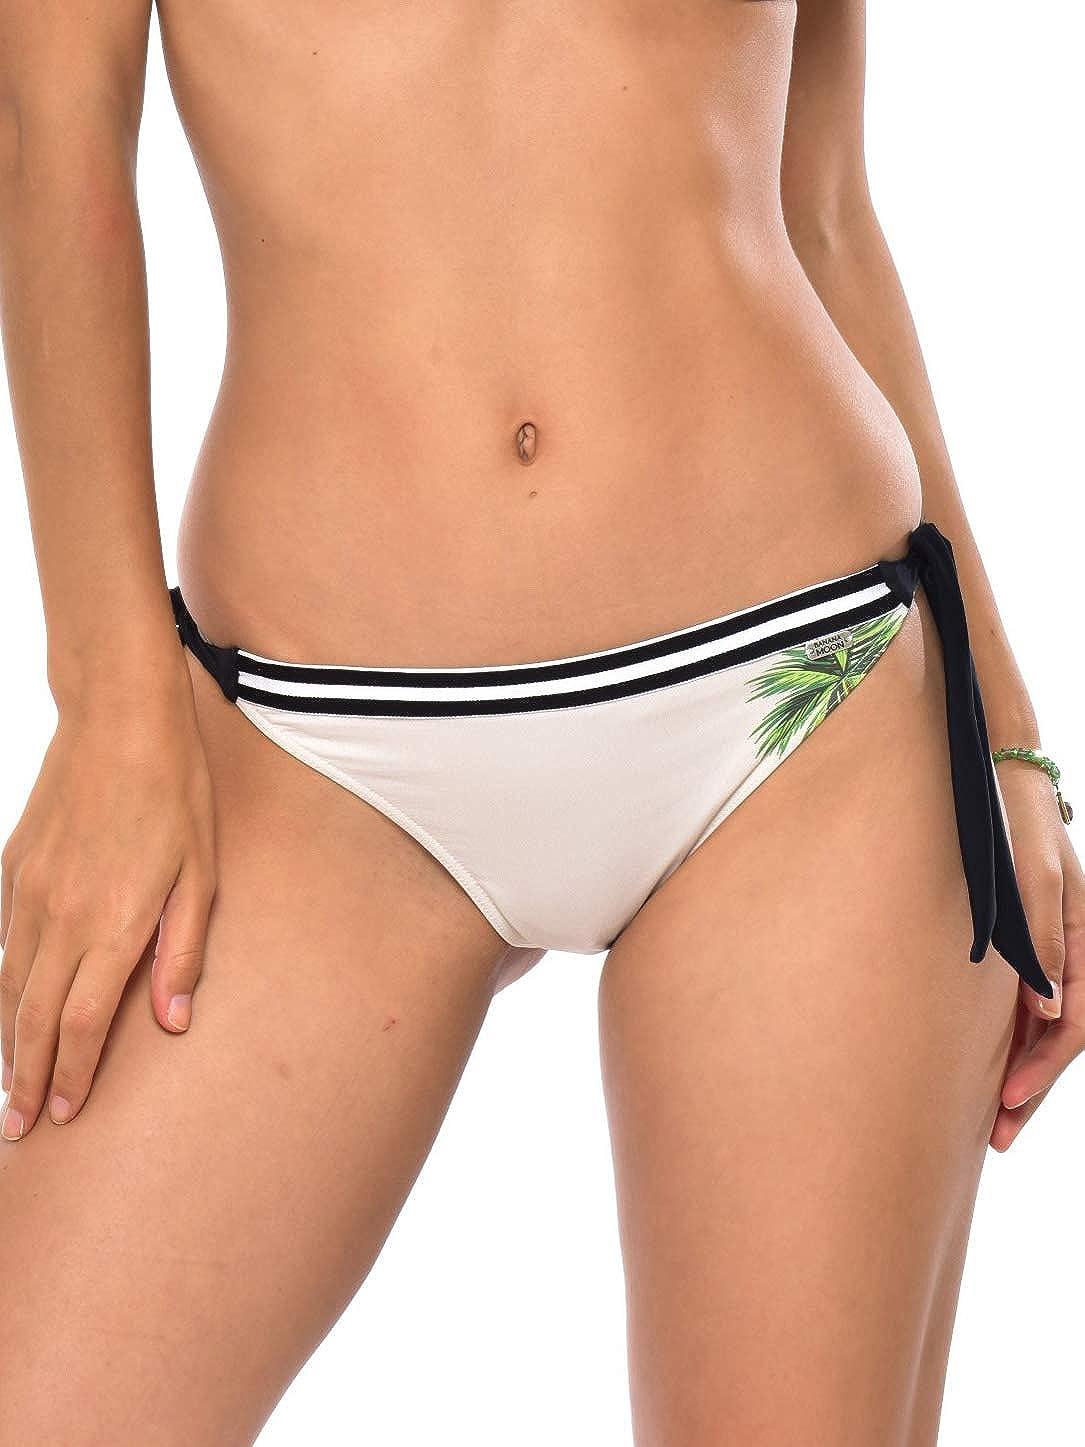 Beige BANANA MOON Sadia SUNPALM Bas de Bikini Culotte Nou/ée